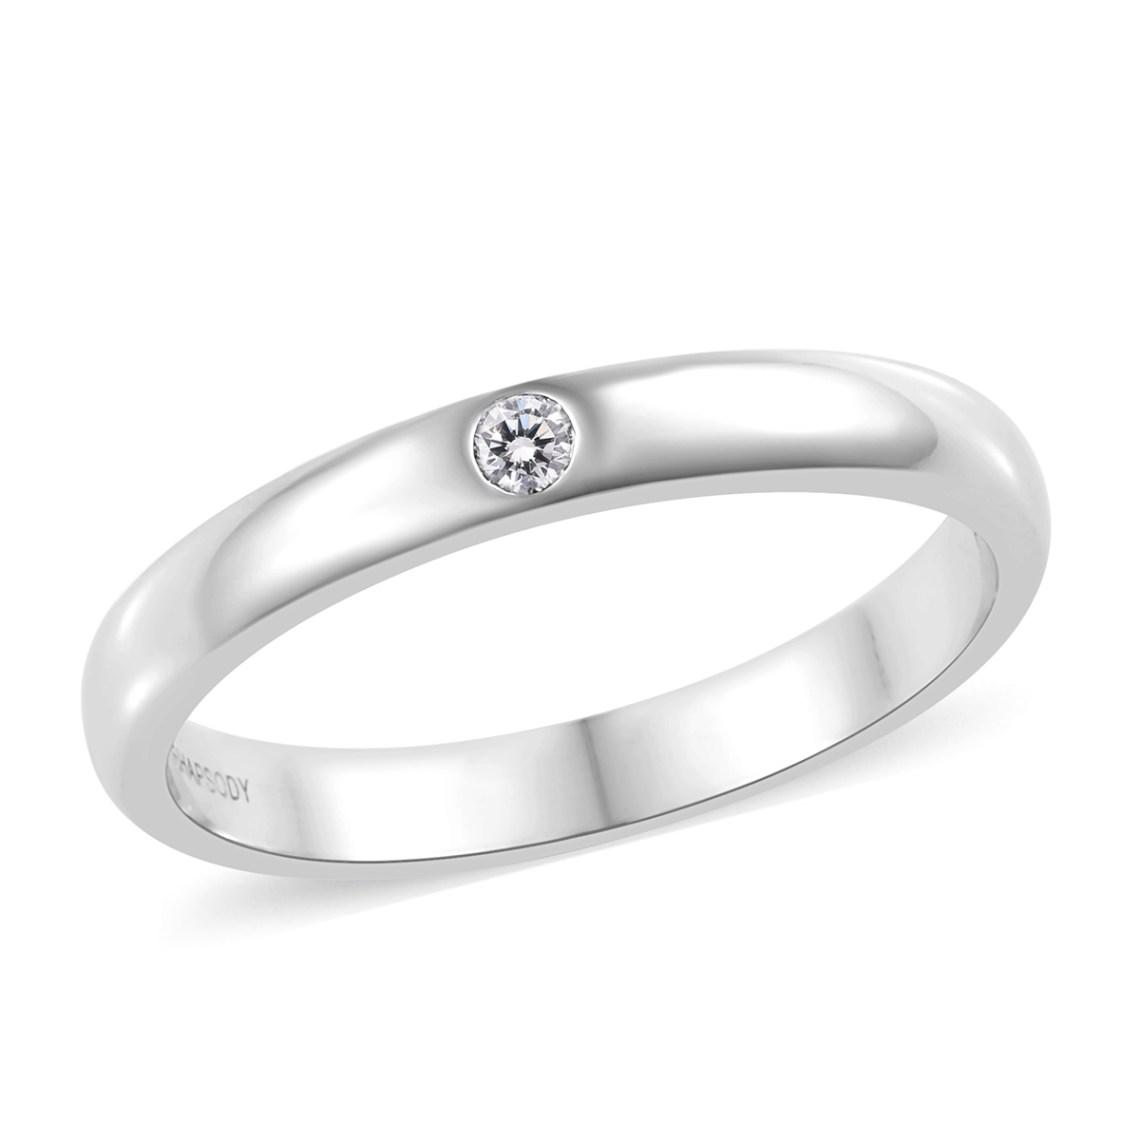 Rhapsody diamond men's ring in platinum.